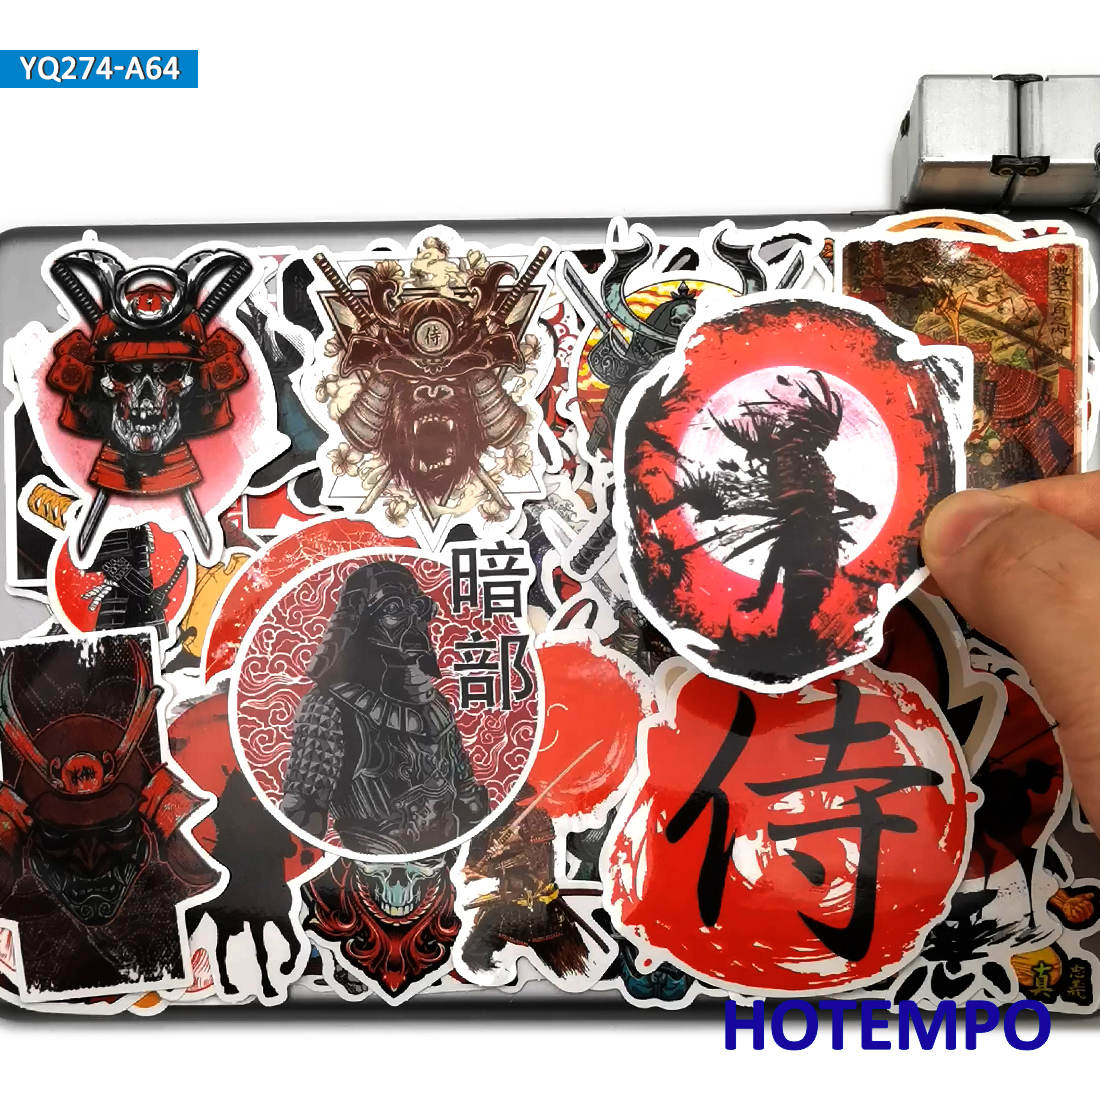 60pcs Japan Samurai Bushido Spirit Style Art Stickers for Mobile Phone Laptop Guitar Suitcase Skateboard Bike Car Decal Stickers